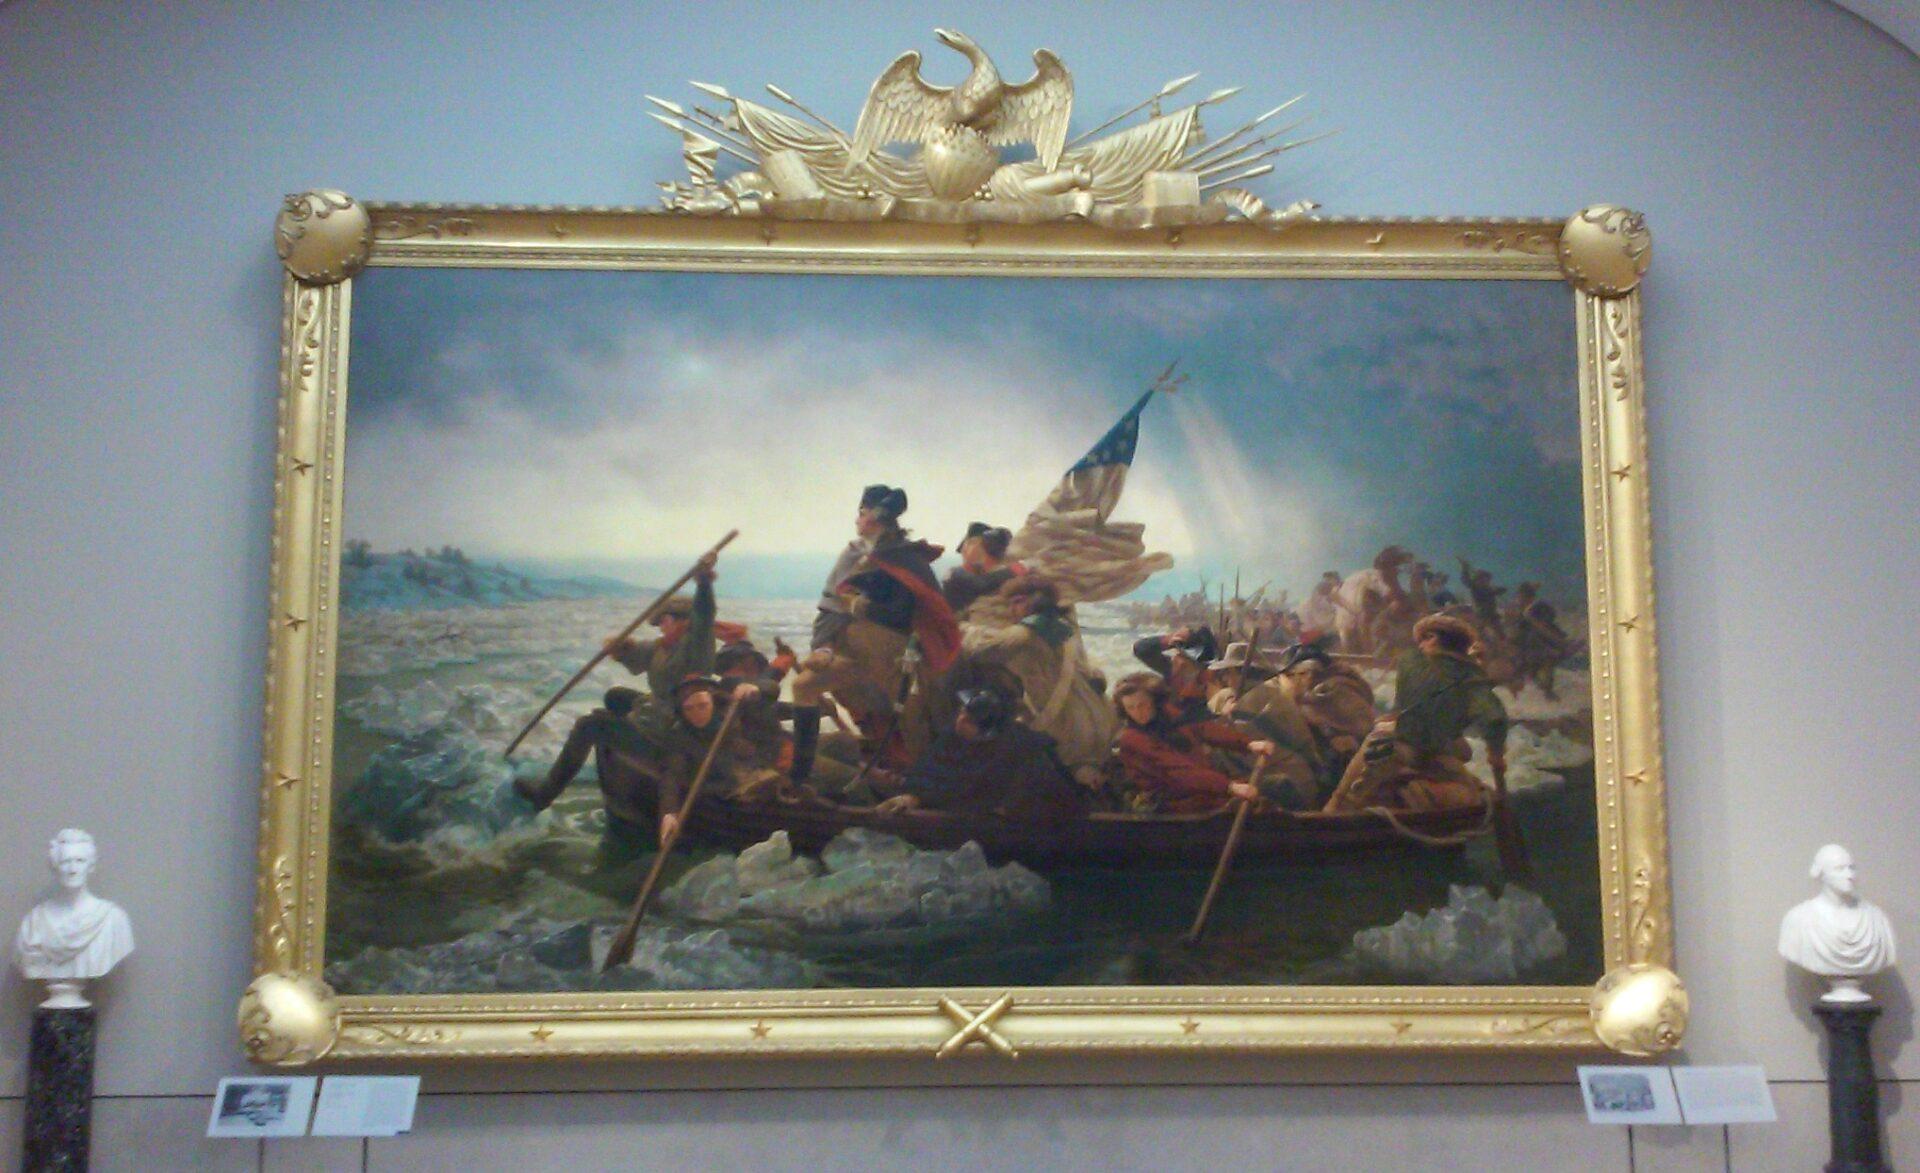 Emanuel Leutze (1816–1868), Washington Crossing the Delaware, 1851, oil on canvas, 149 x 255 in. (378.5 x 647.7 cm), Metropolitan Museum, New York. Photo: Ilaria M. P. Barzaghi.